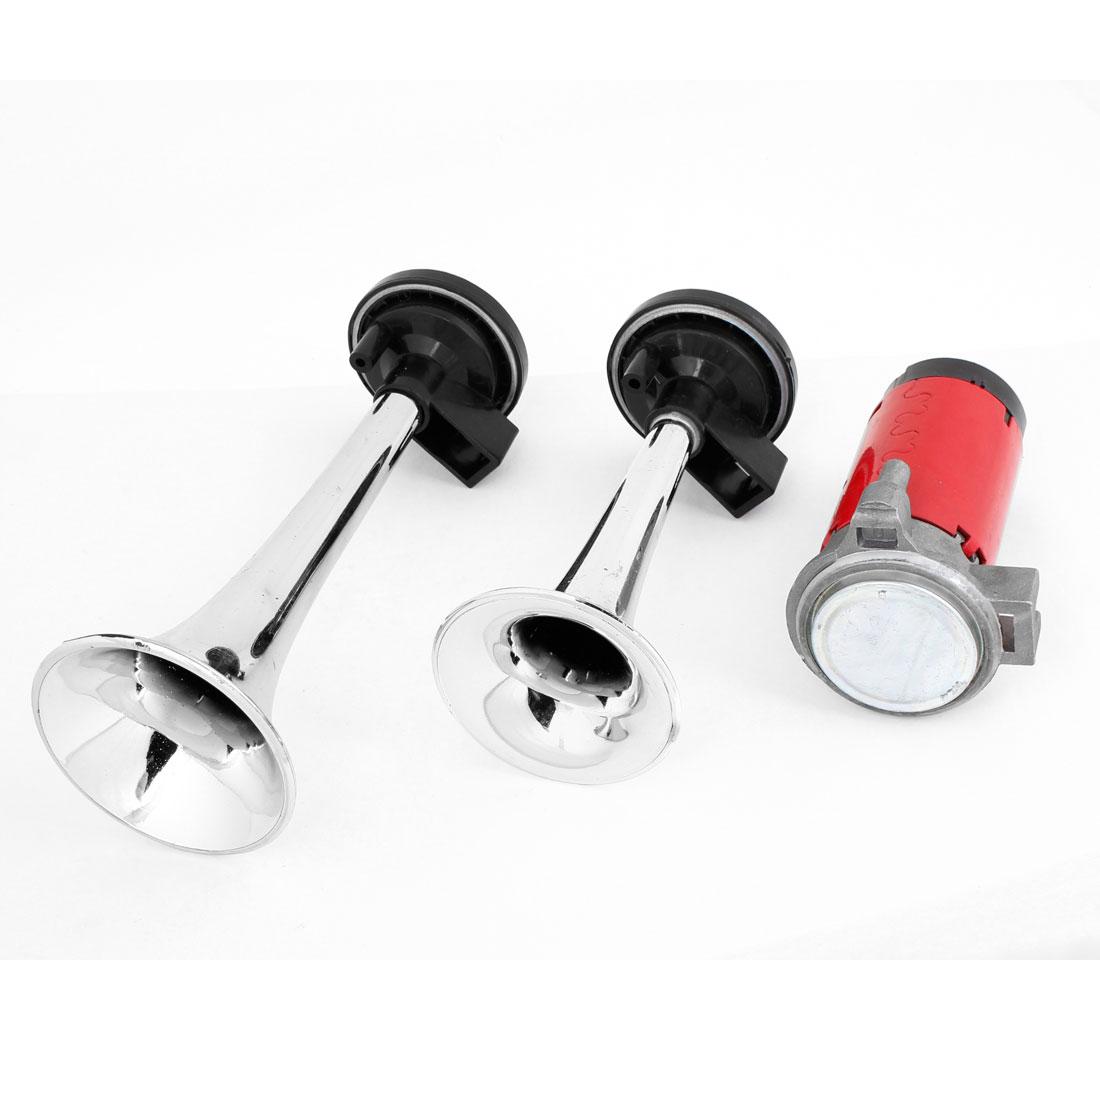 Auto Car Vehicle DC 12V Dual Trumpet Loud Air Horn Spare Part Black Silver Tone